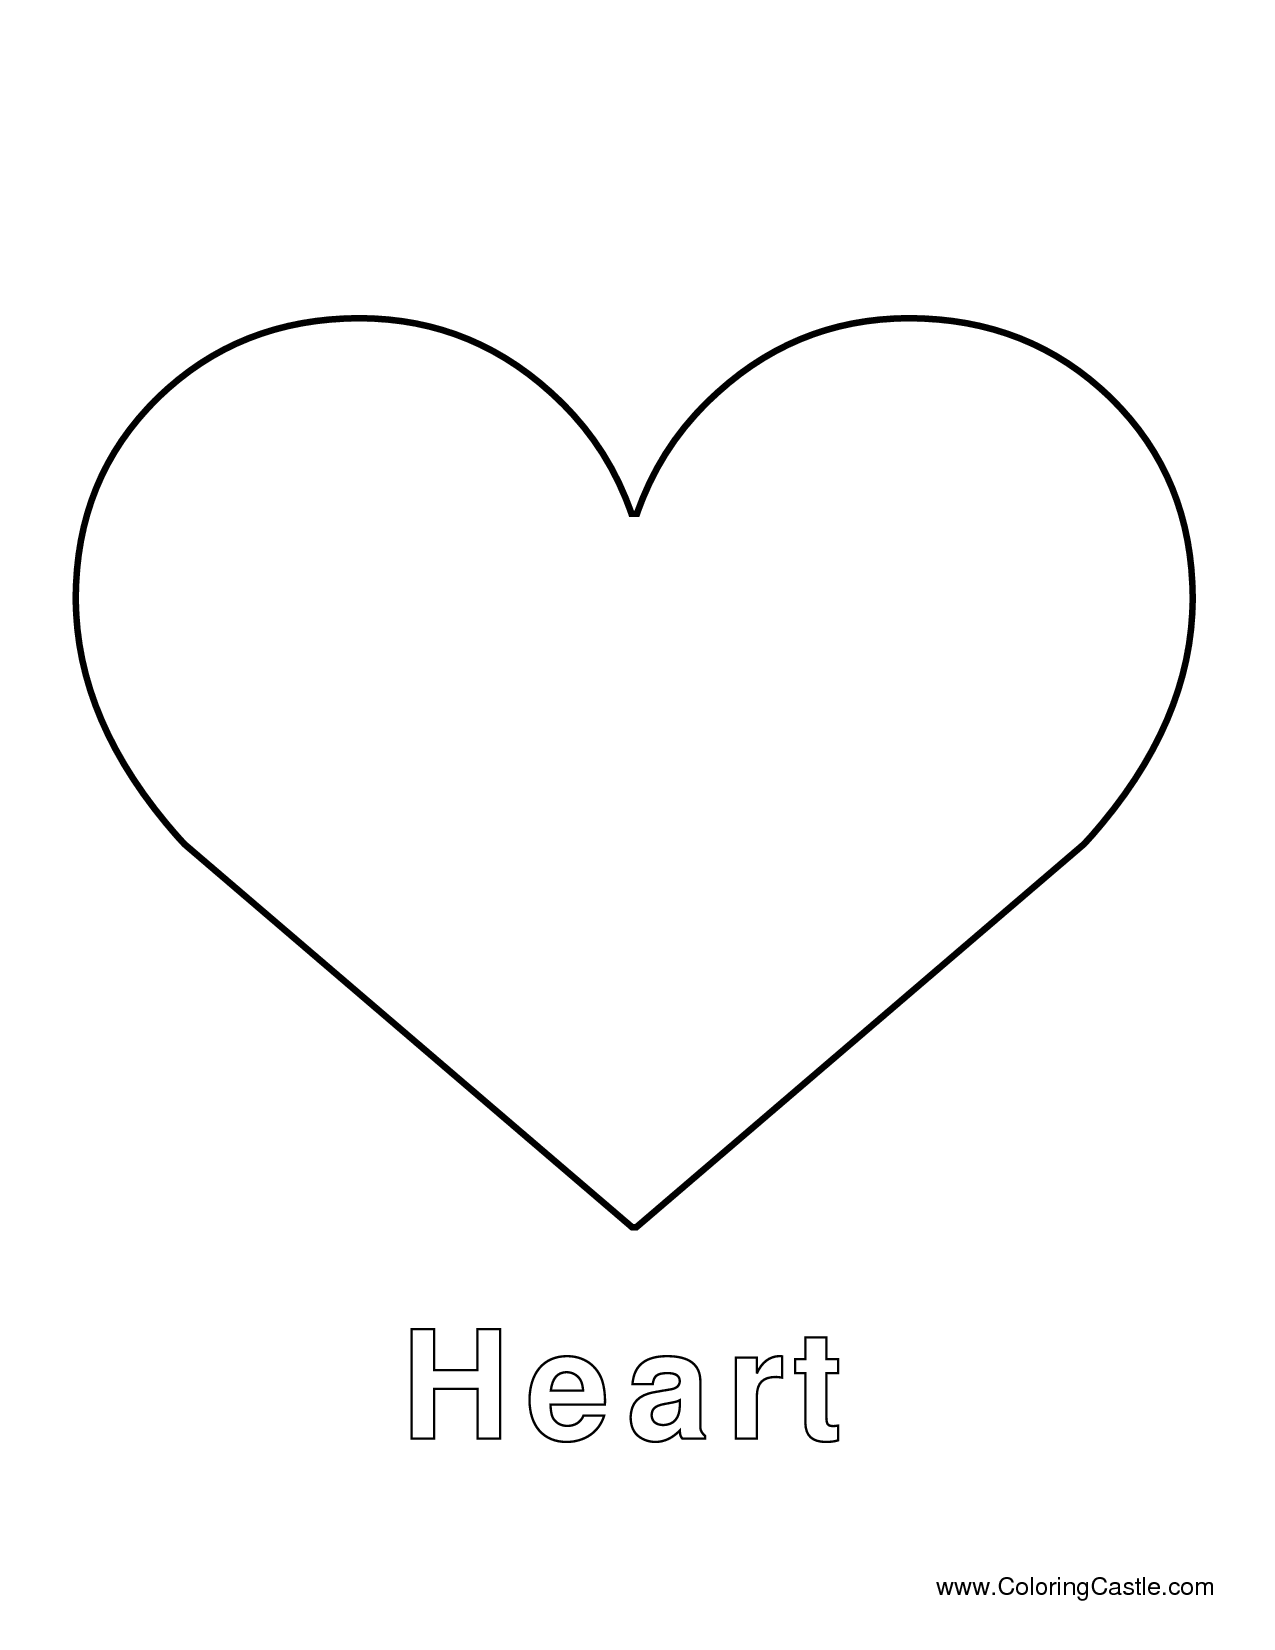 Heart Stencils To Print